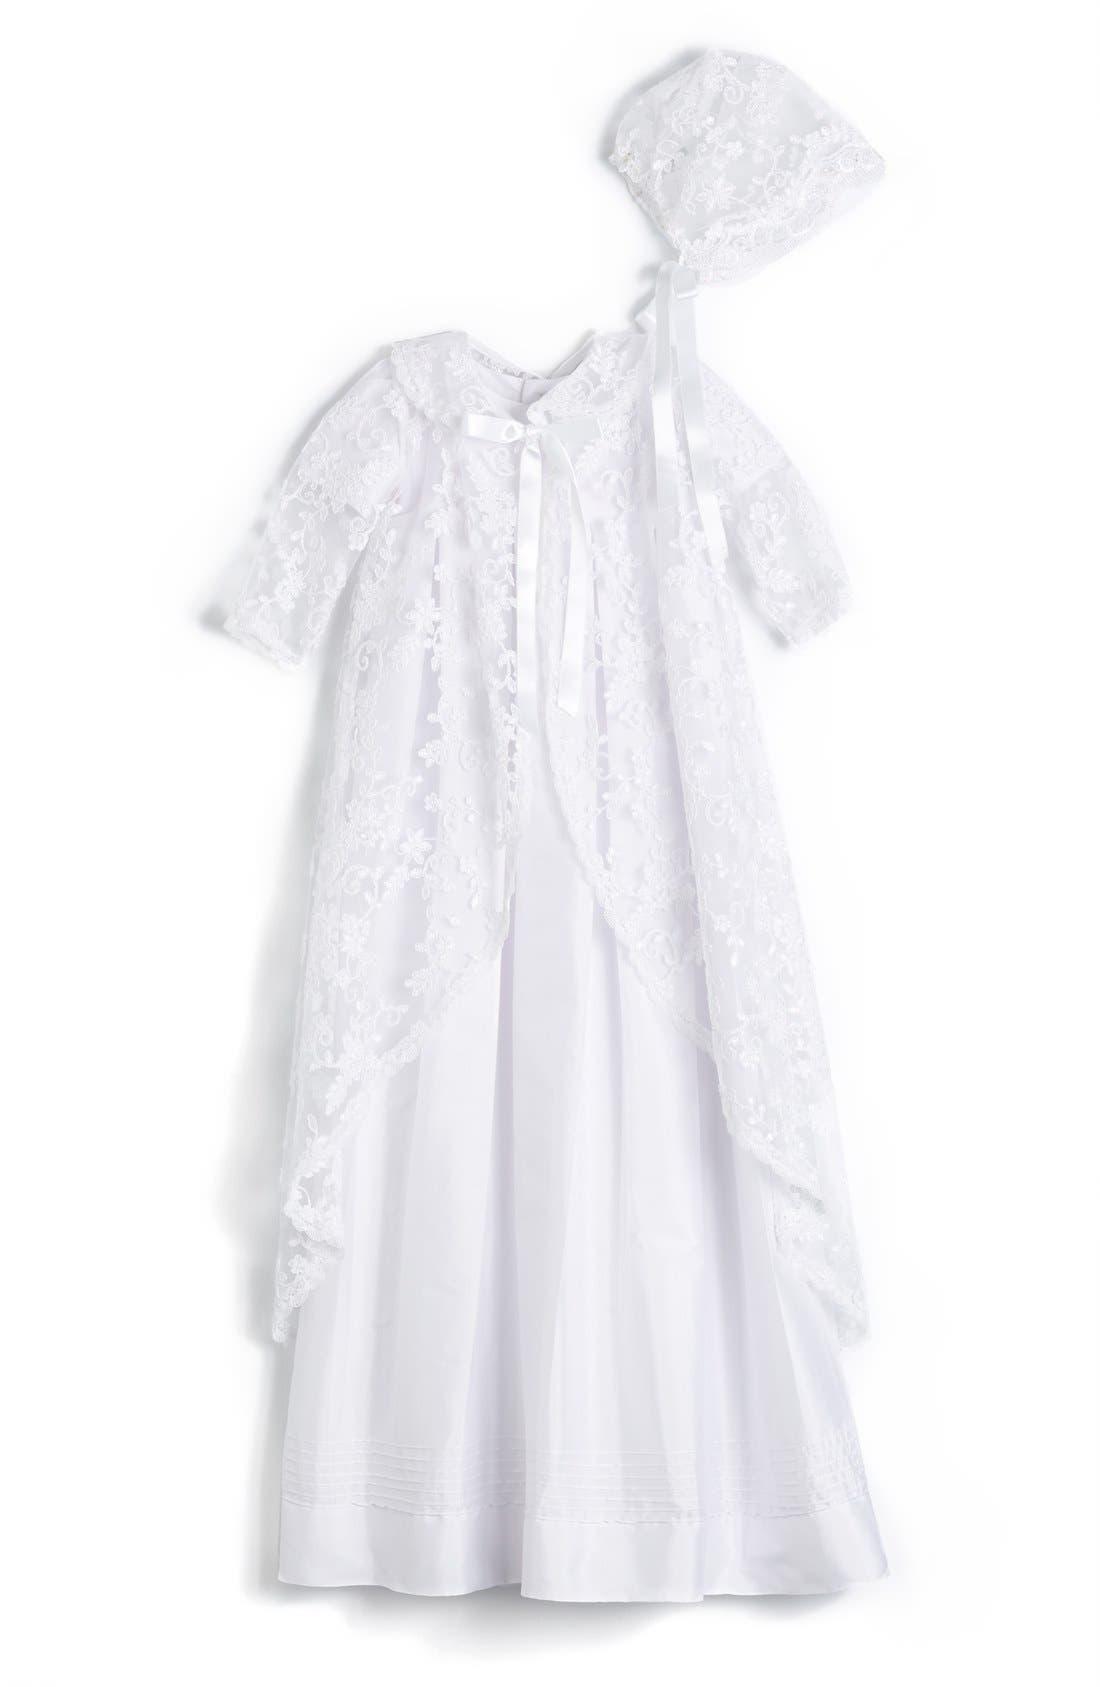 Main Image - Isabel Garreton 'Renaissance' Christening Gown & Bonnet (Baby)